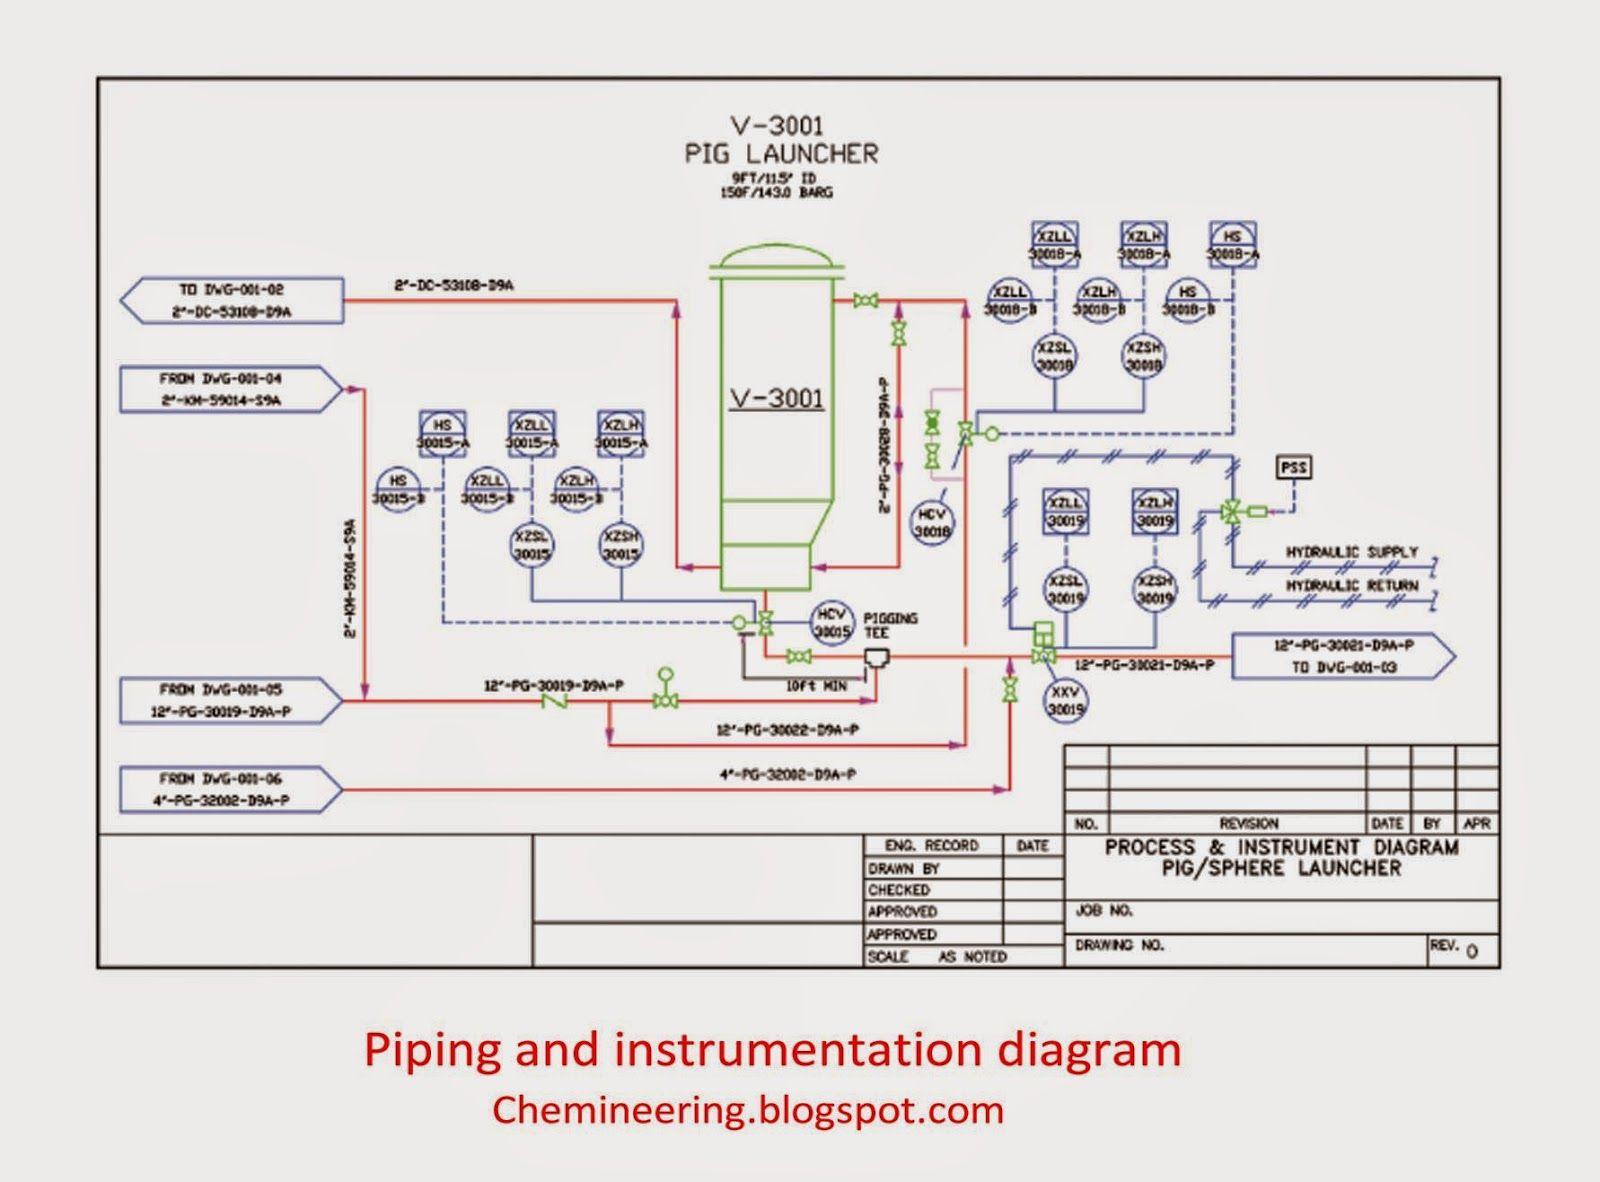 medium resolution of piping and instrumentation diagram by chemineering blogspot com piping instrumentation diagram pdf piping instrumentation diagram